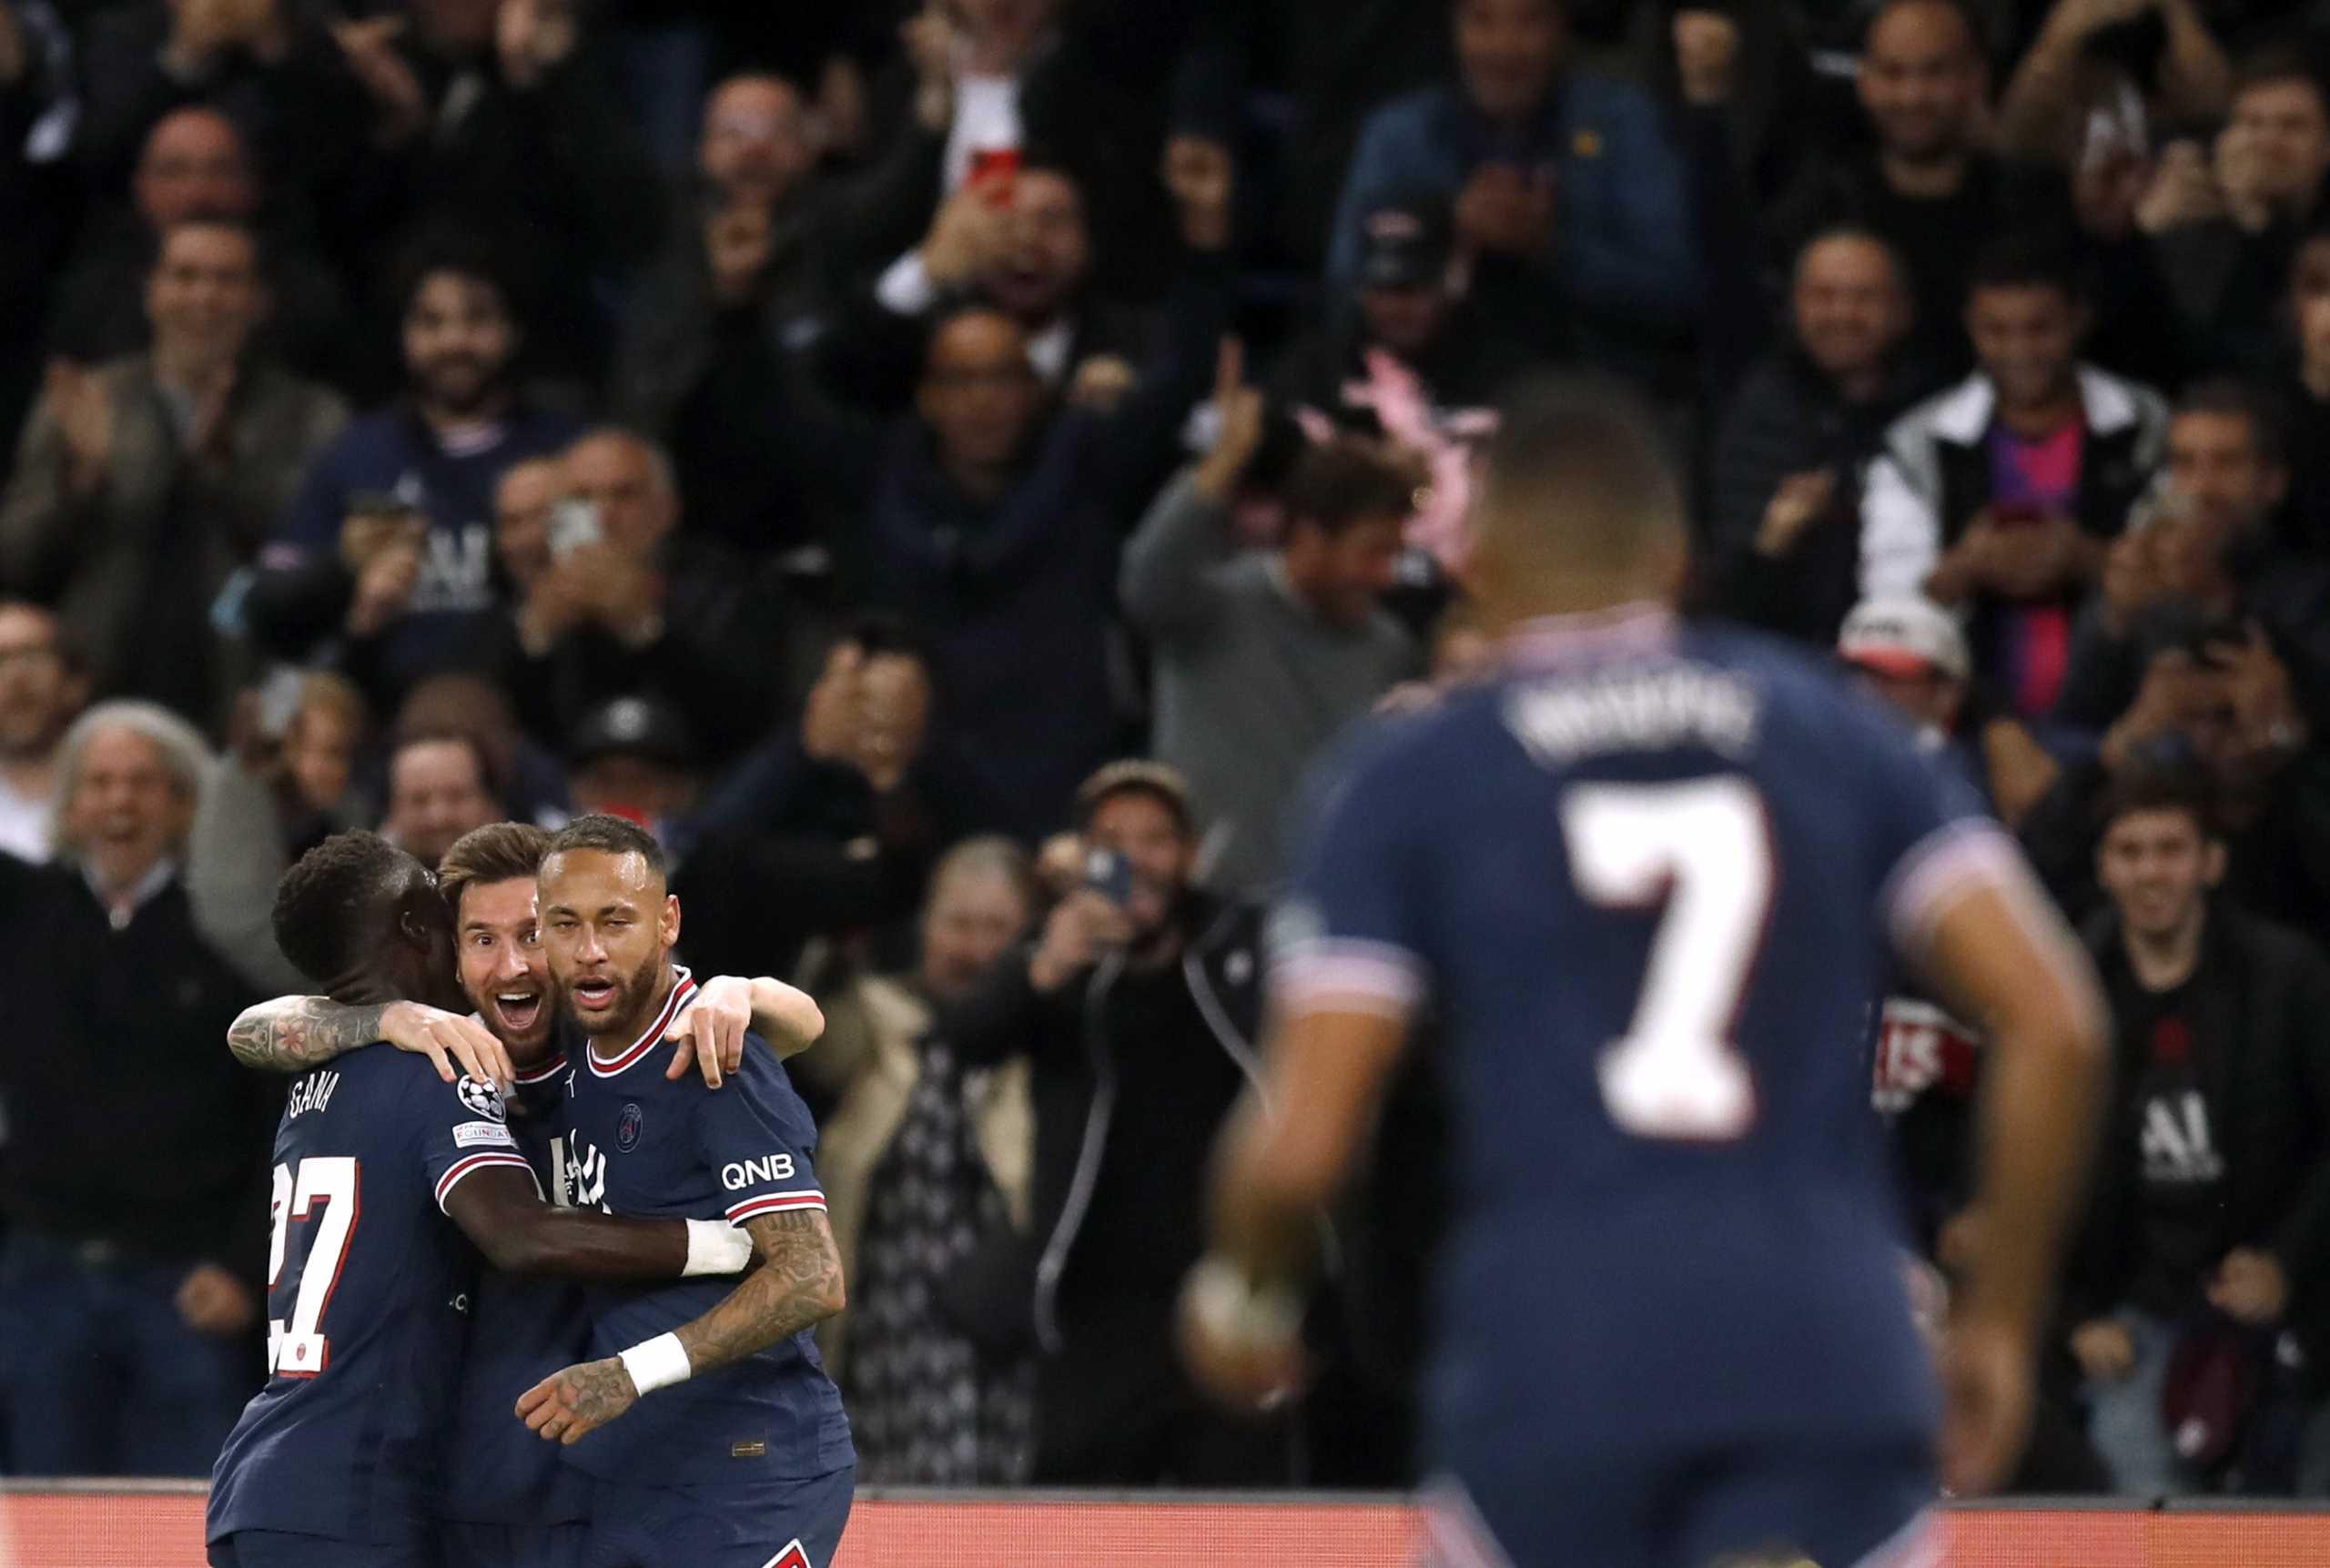 Champions League, Παρί – Σίτι 2-0, Λειψία – Μπριζ 1-2 – Ο Μέσι έκρινε το ντέρμπι, «μάγεψαν» οι Βέλγοι